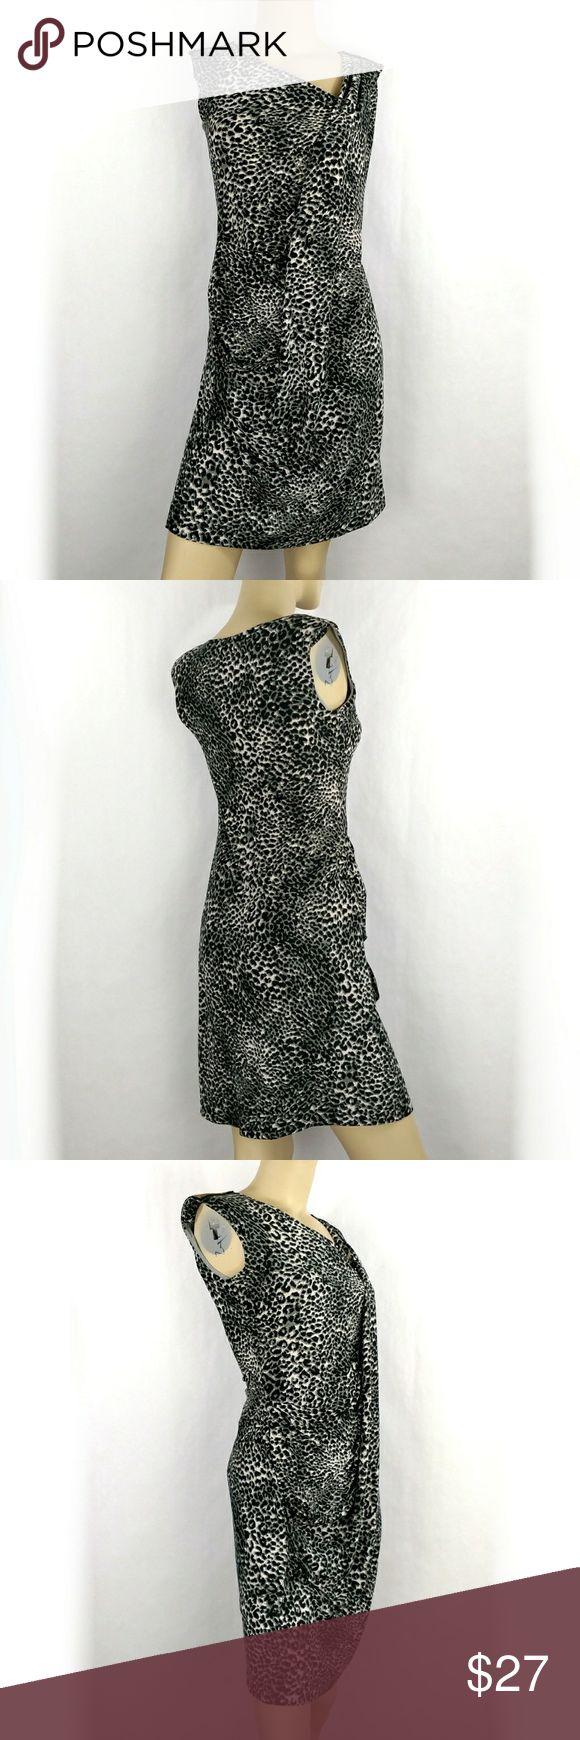 TANGO animal print bodycon pencil dress. Medium TANGO animal print grey black bodycon pencil dress Womens Medium (J) tango Dresses